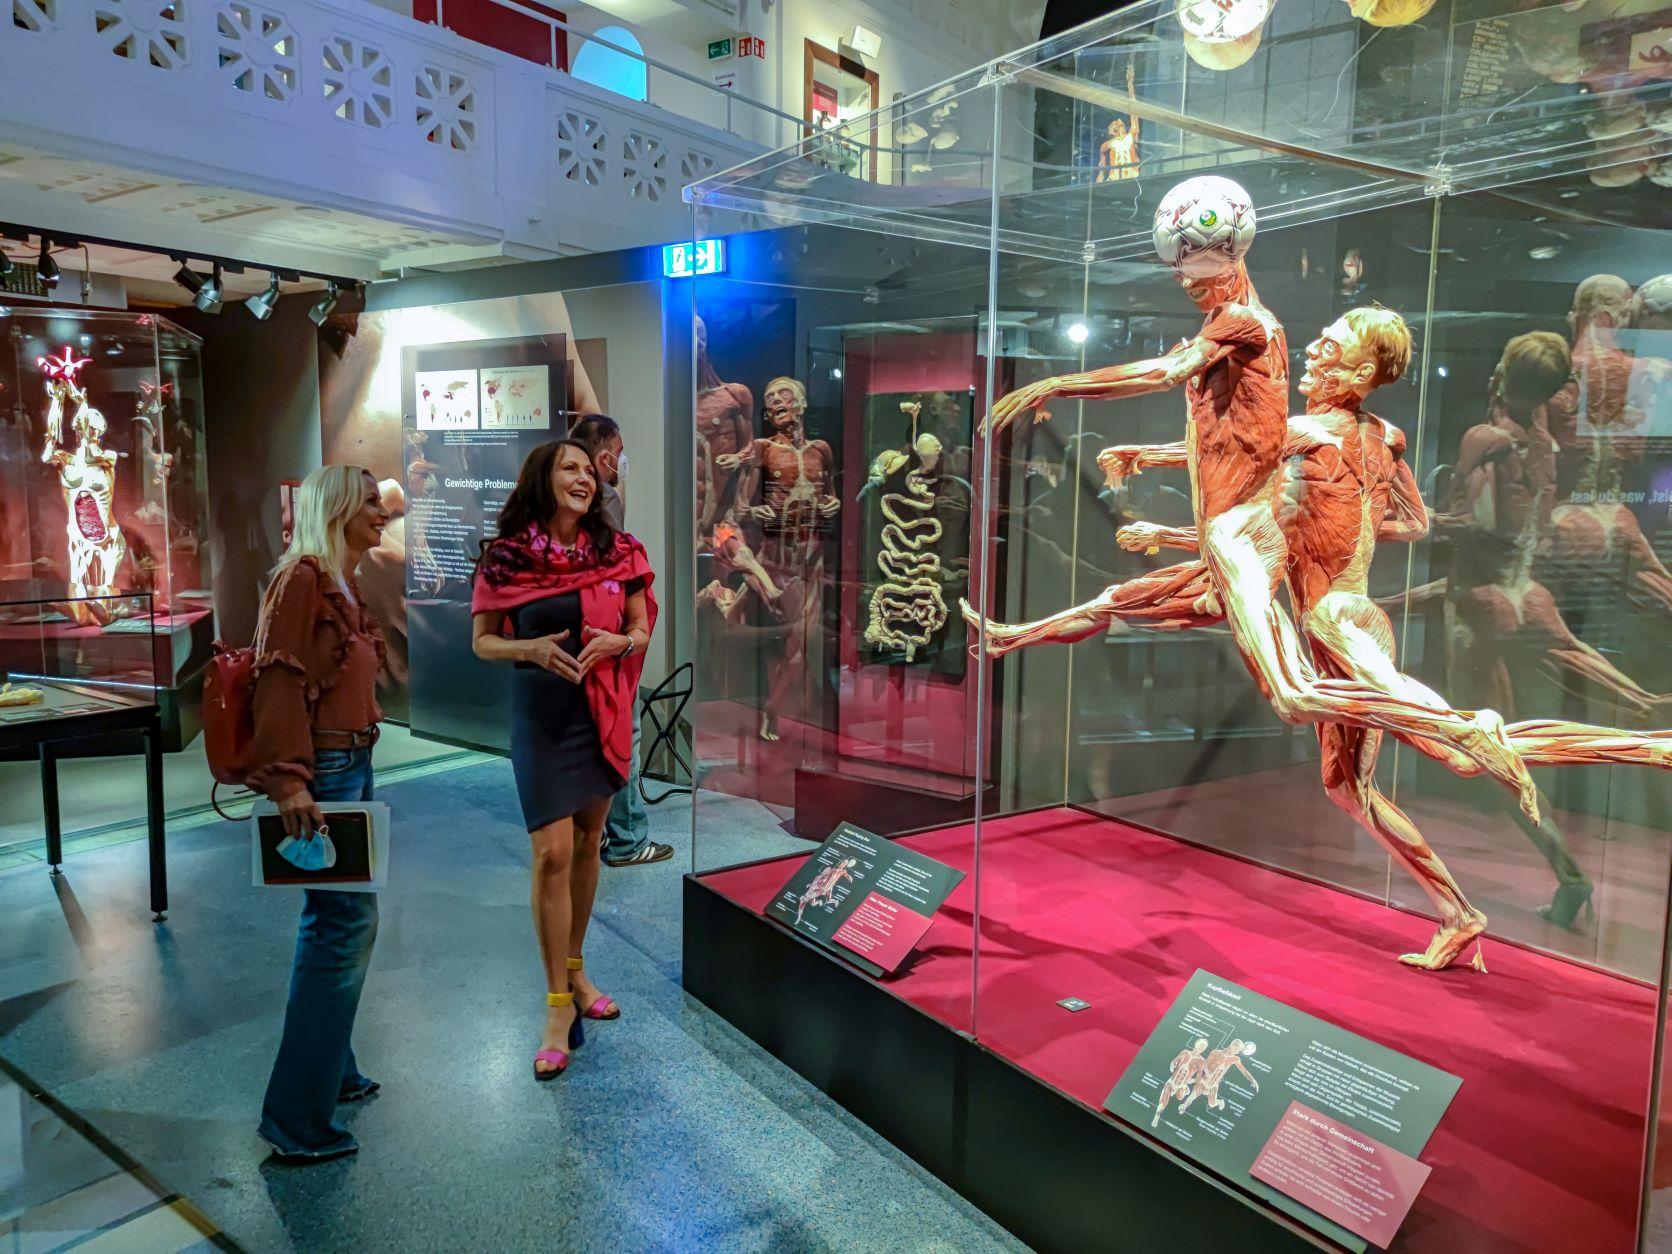 Body Worlds: Ένα ταξίδι στο ανθρώπινο σώμα - Έκθεση στον Ελληνικό Κόσμο